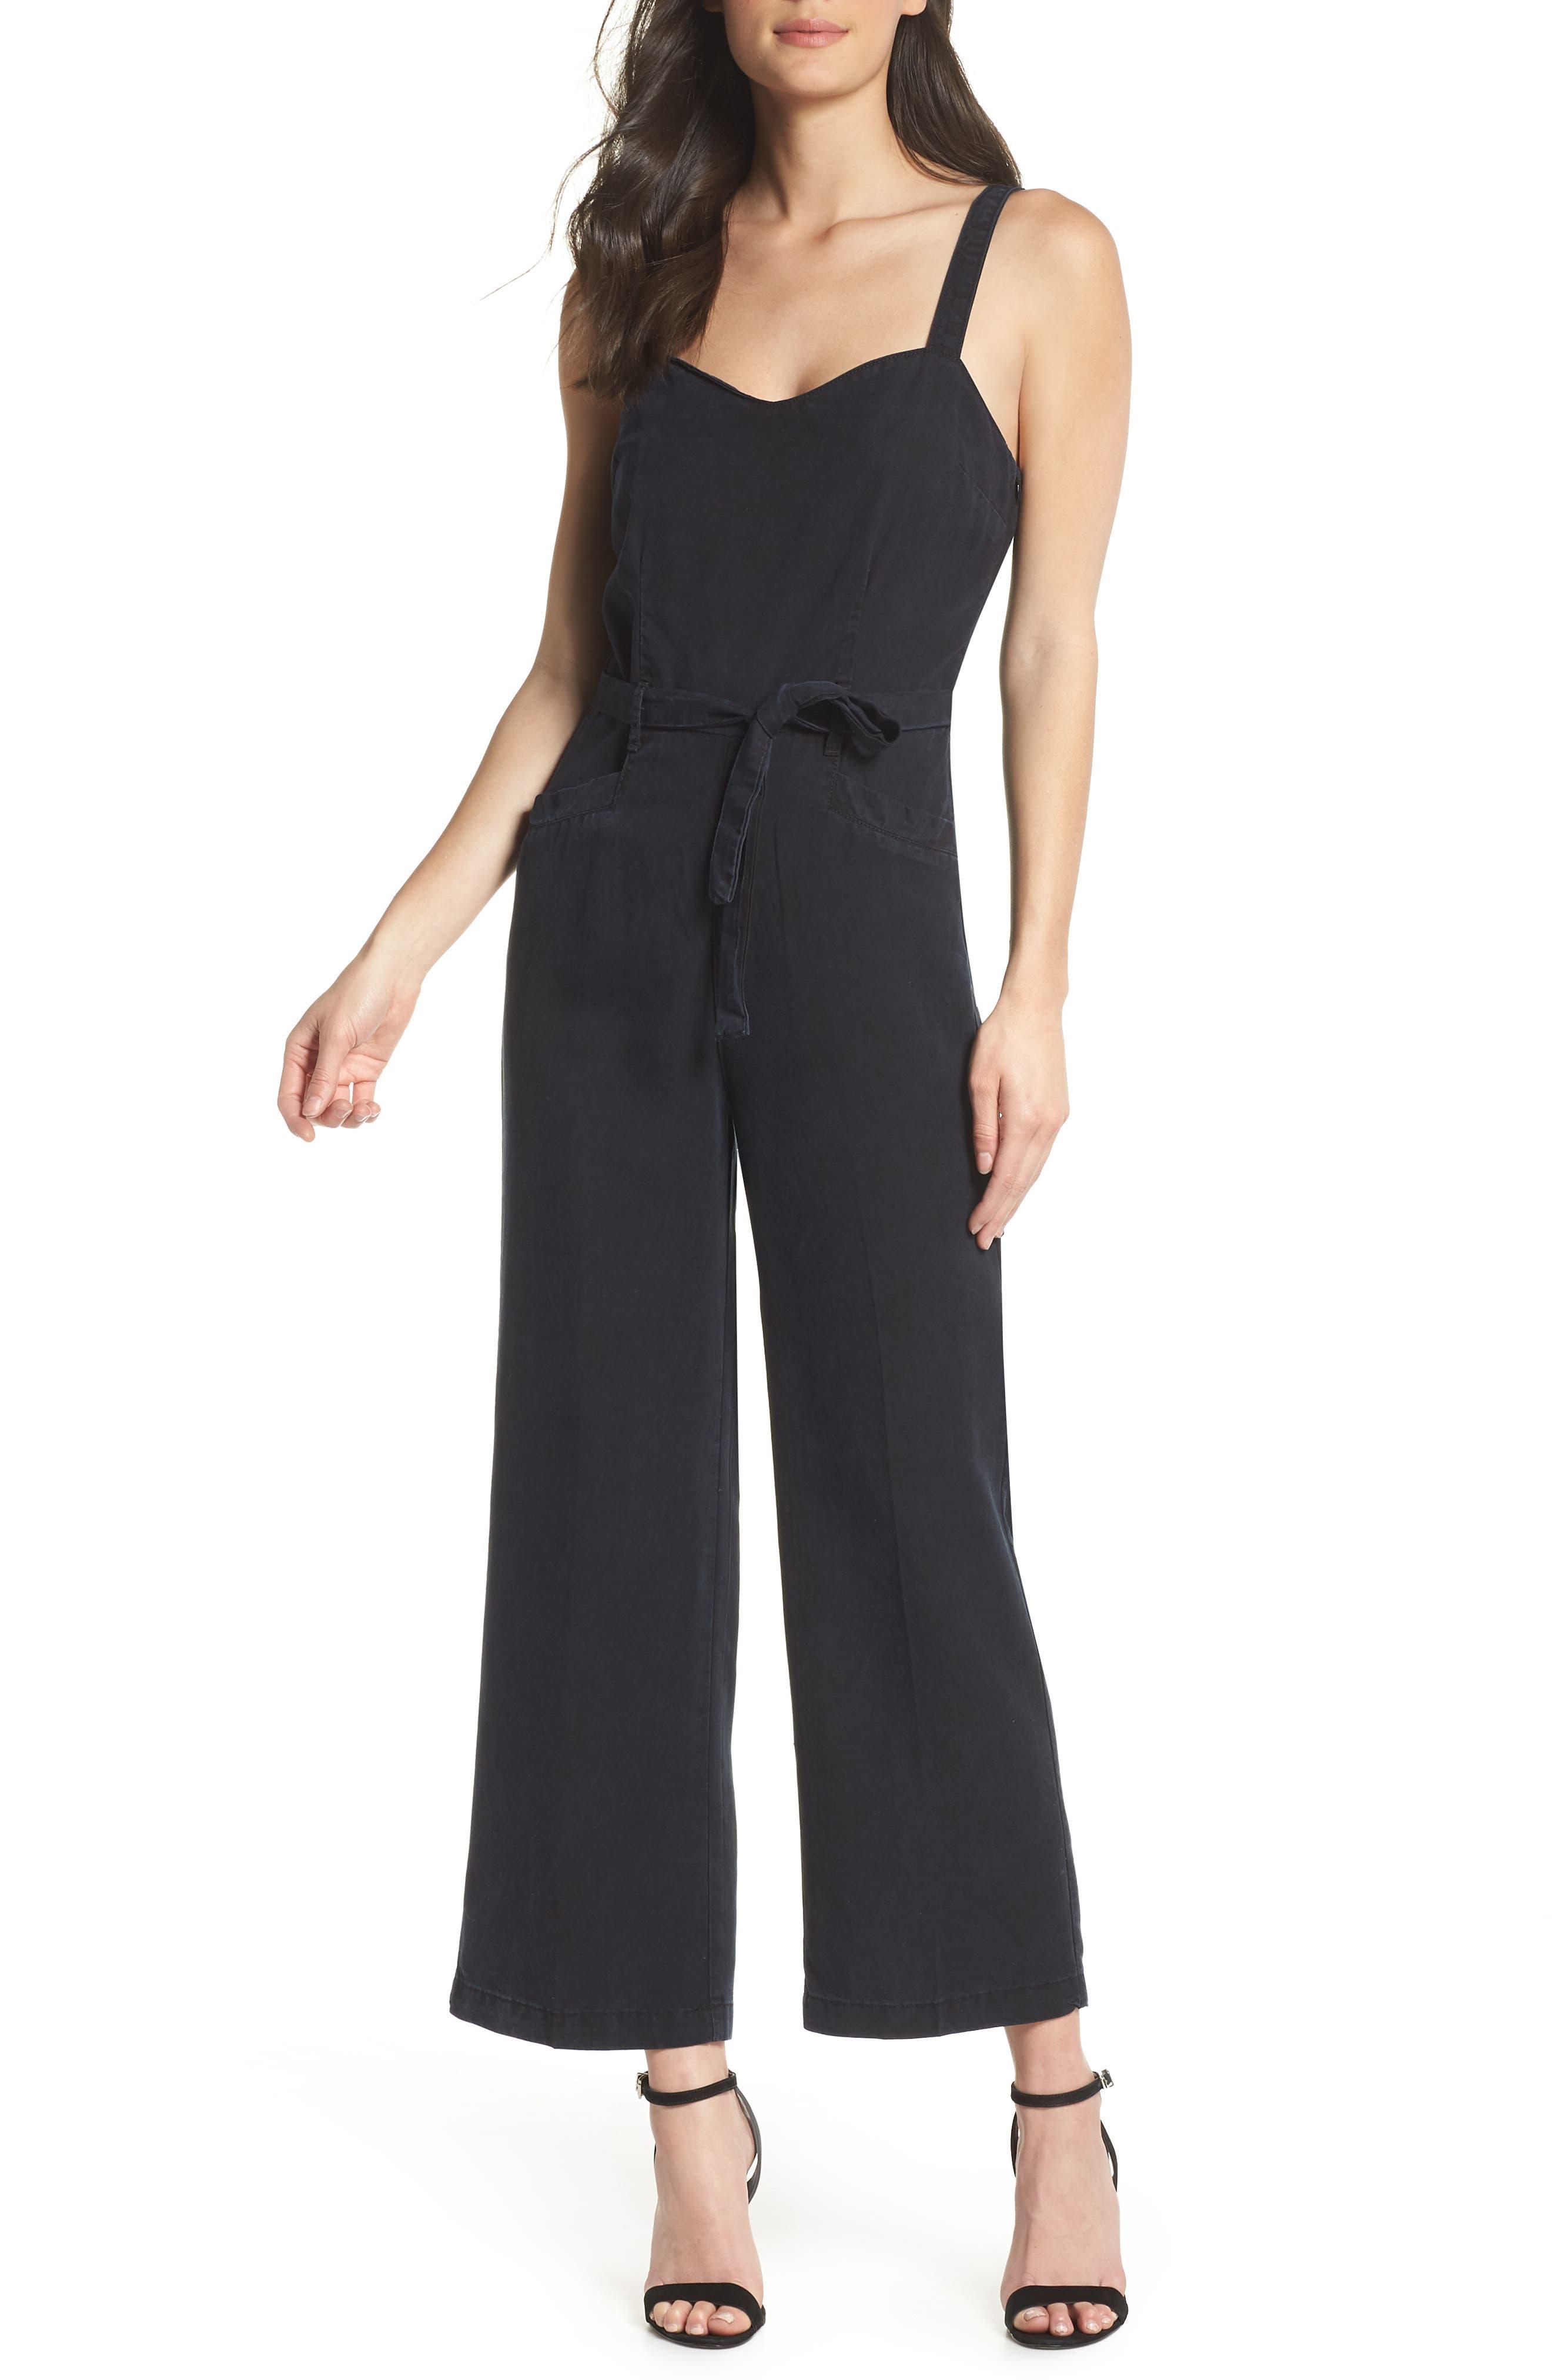 Emma Tie-Waist Jumpsuit,                         Main,                         color, Black Pearl